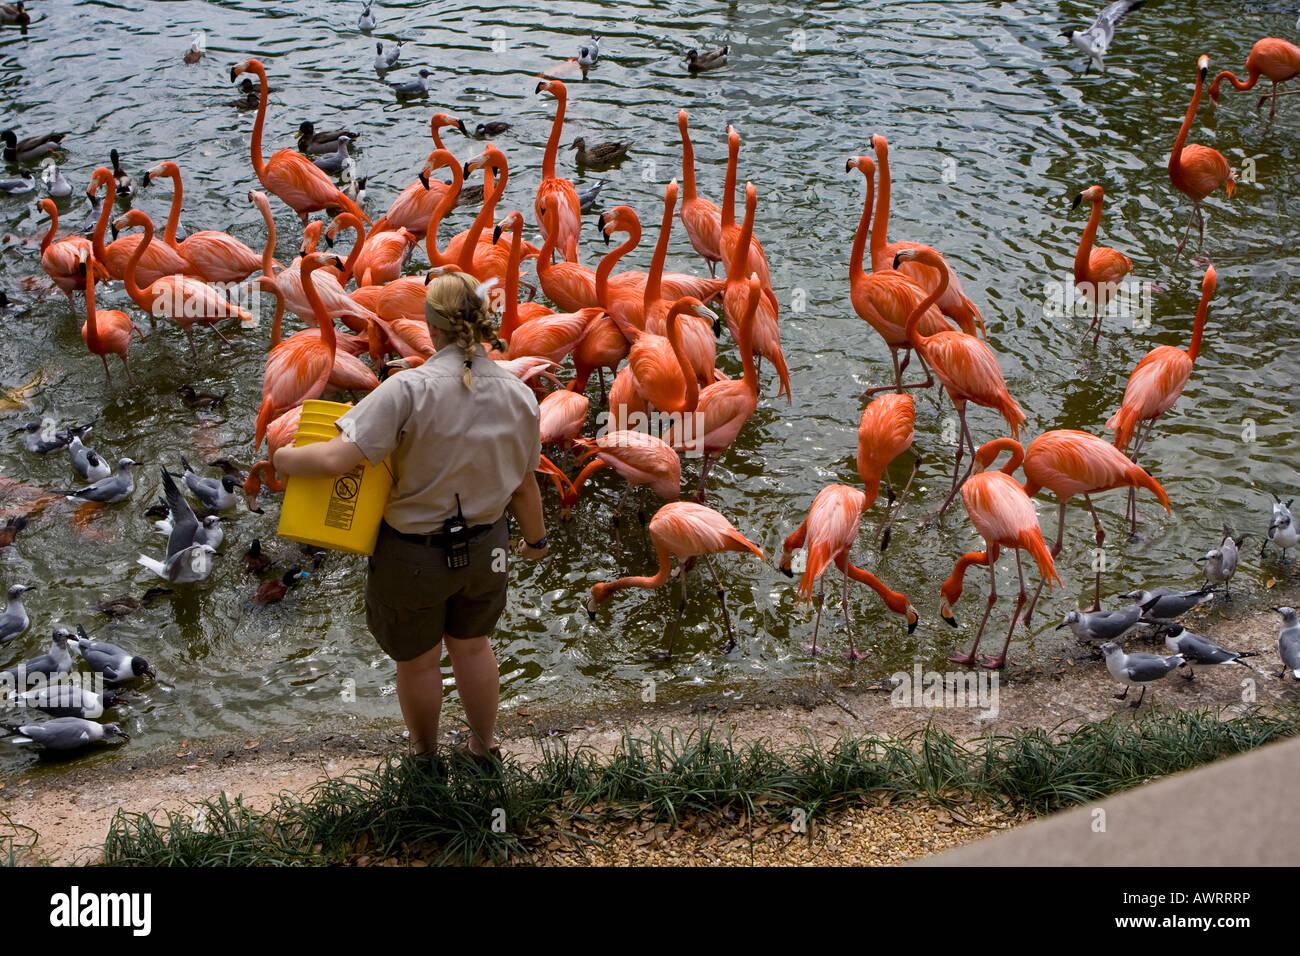 Modern Busch Gardens Tampa Address Image Collection - Brown Nature ...